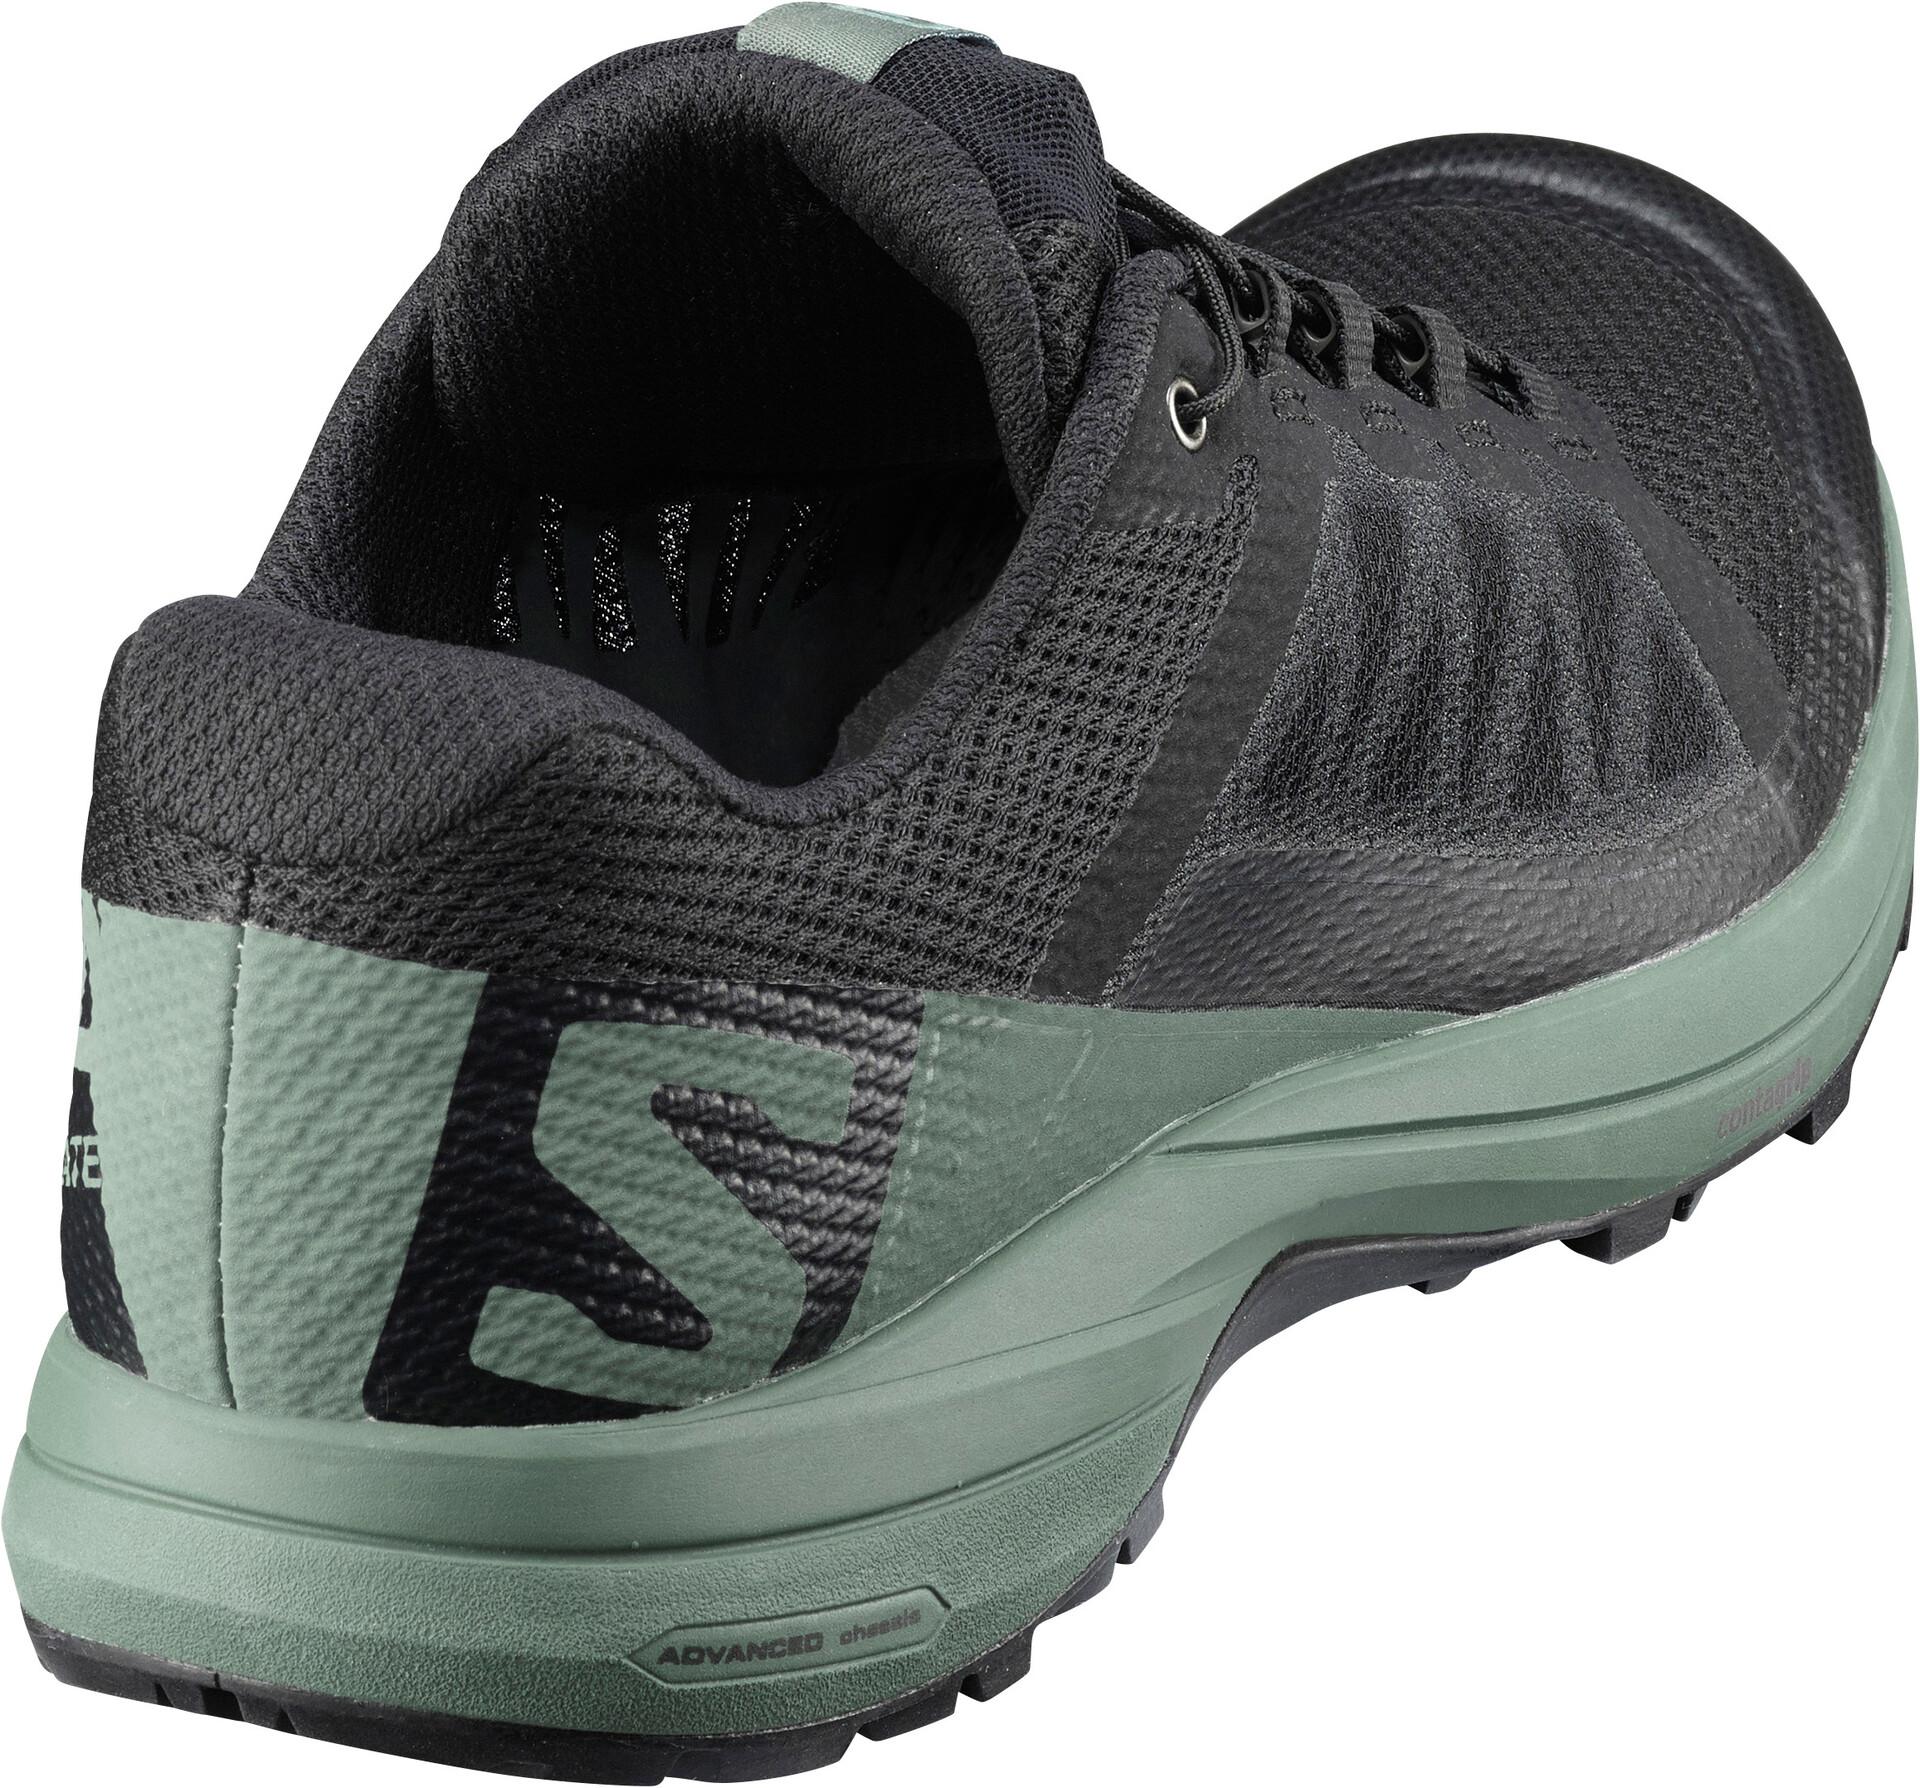 Elevate Salomon Chaussures Xa HommeBlackbalsam Greenblack eWdrxBoC